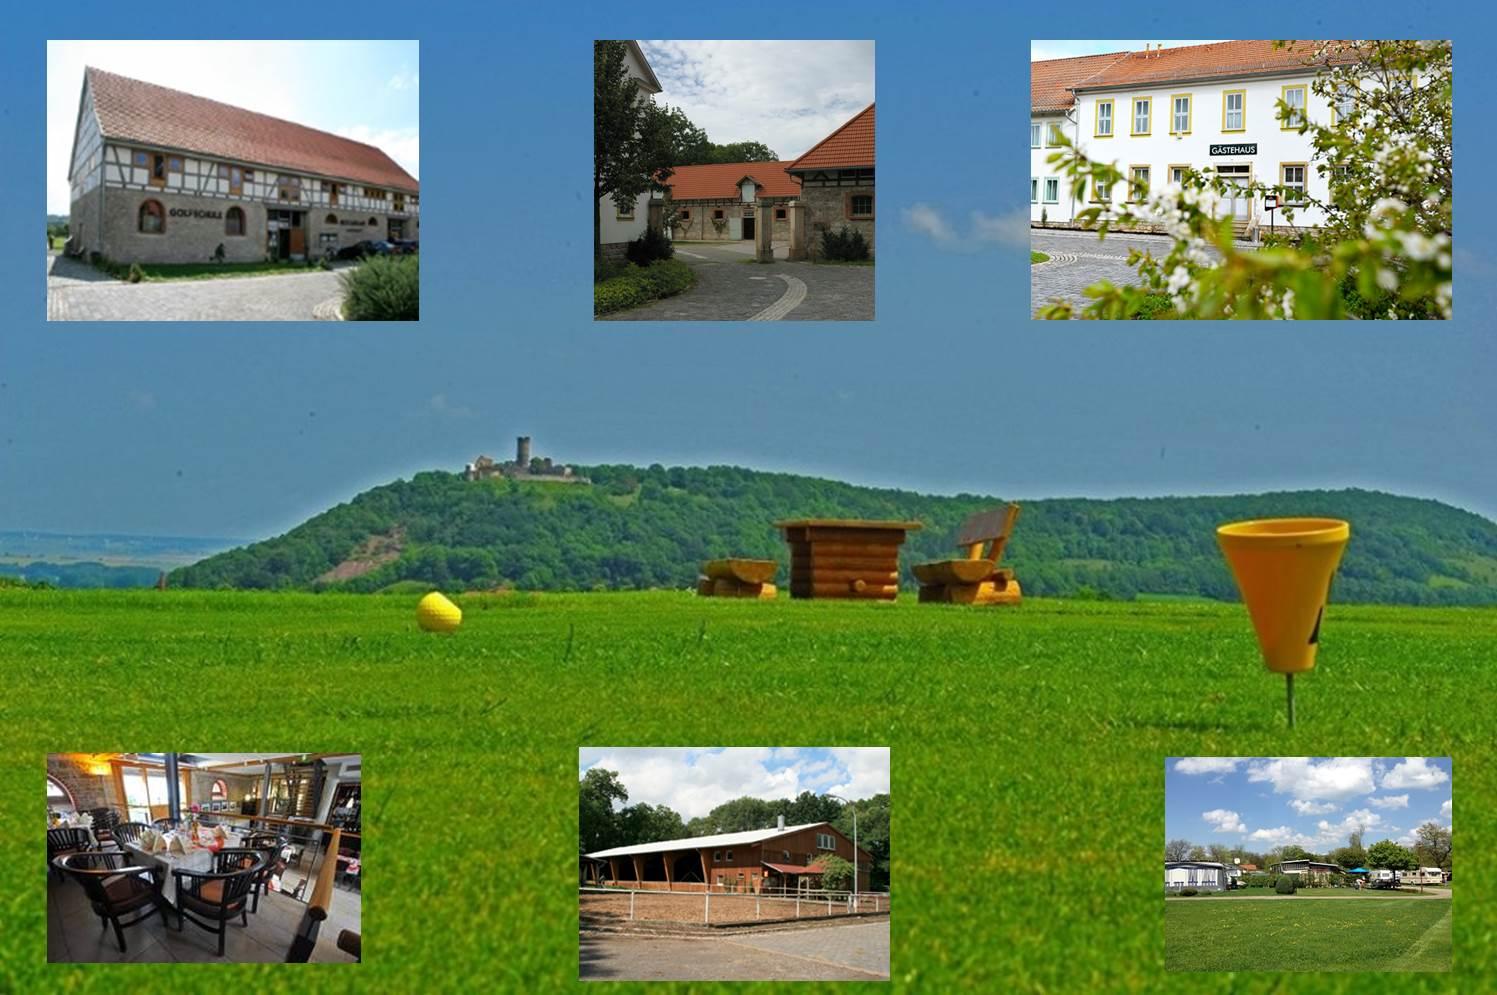 ringhofen